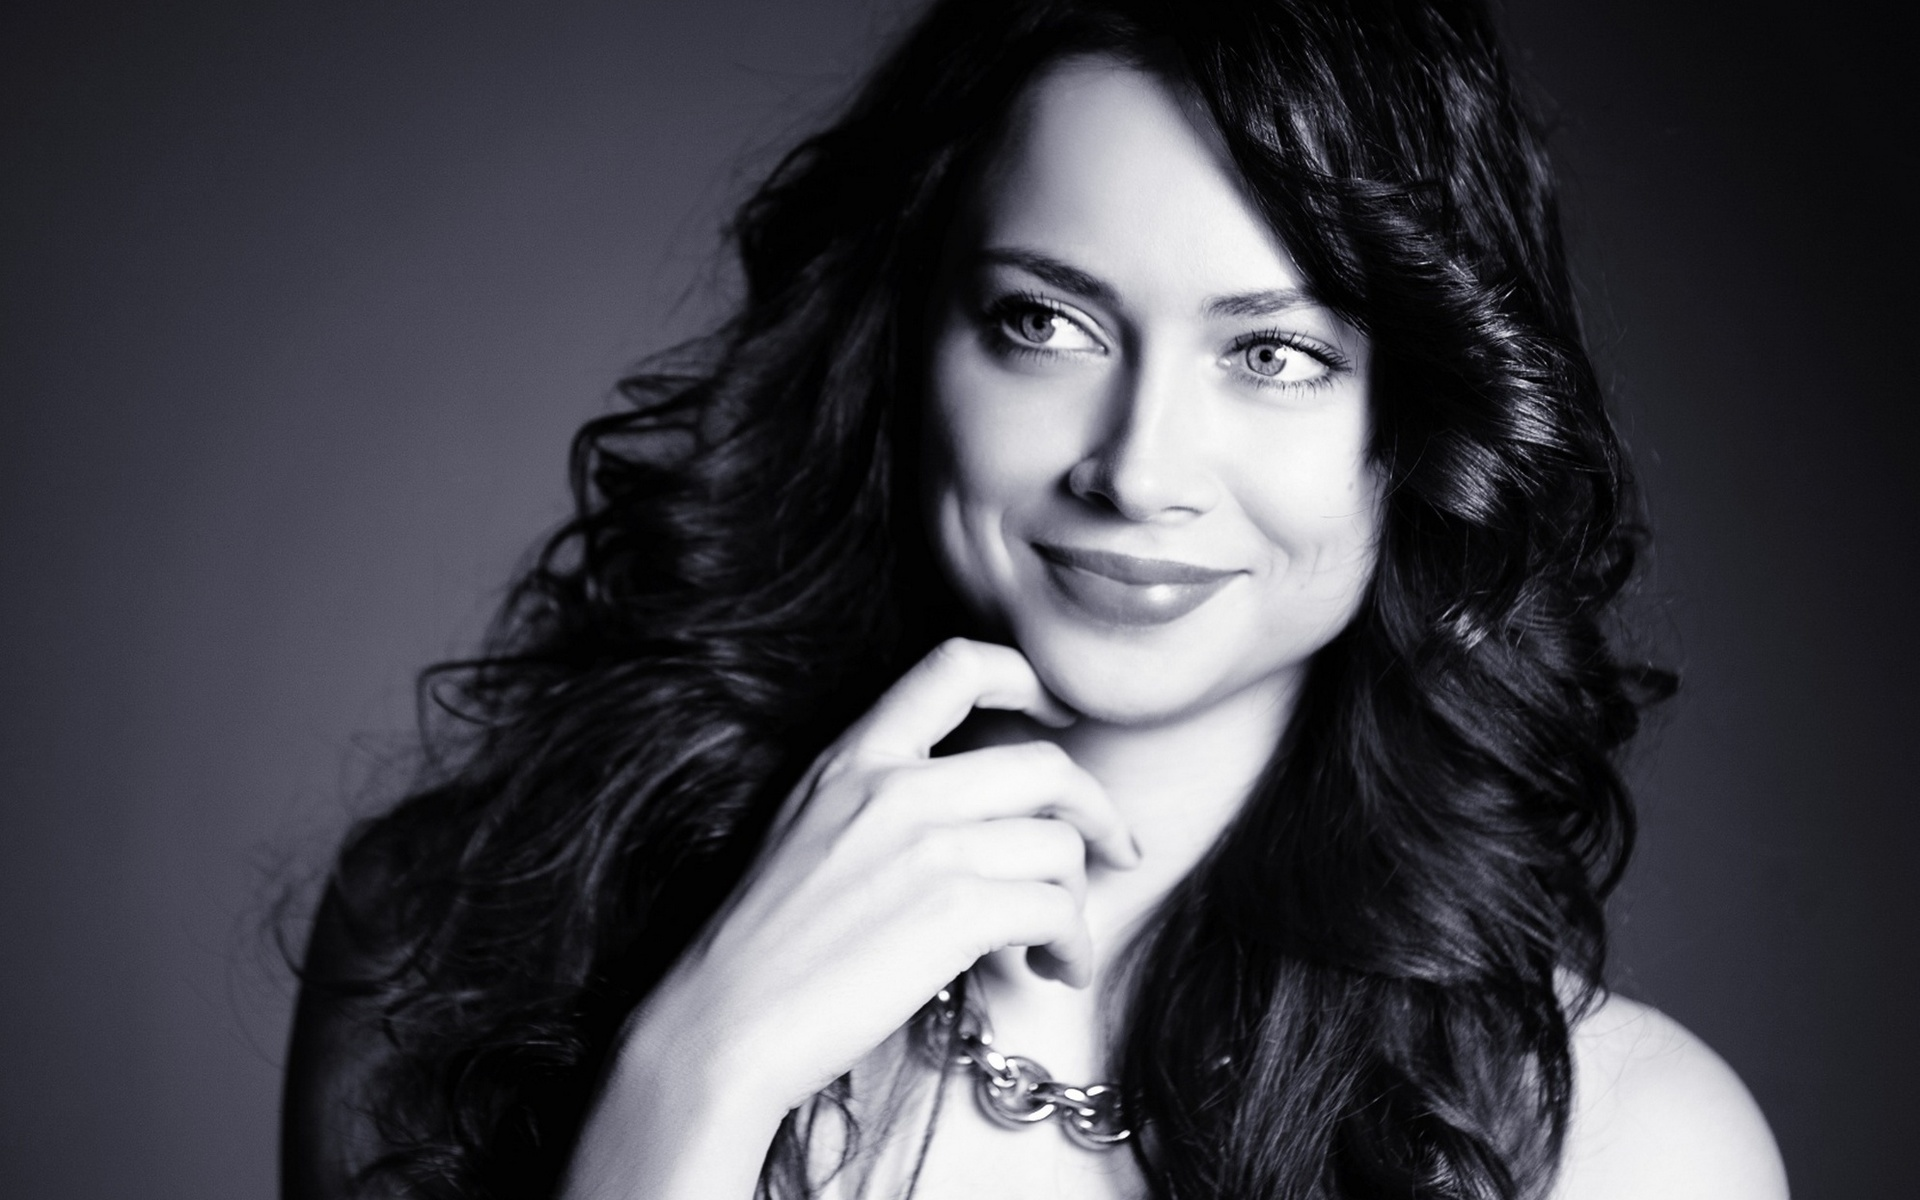 Фото российских актрис высокого разрешения, порно фото галереи мокрая киска